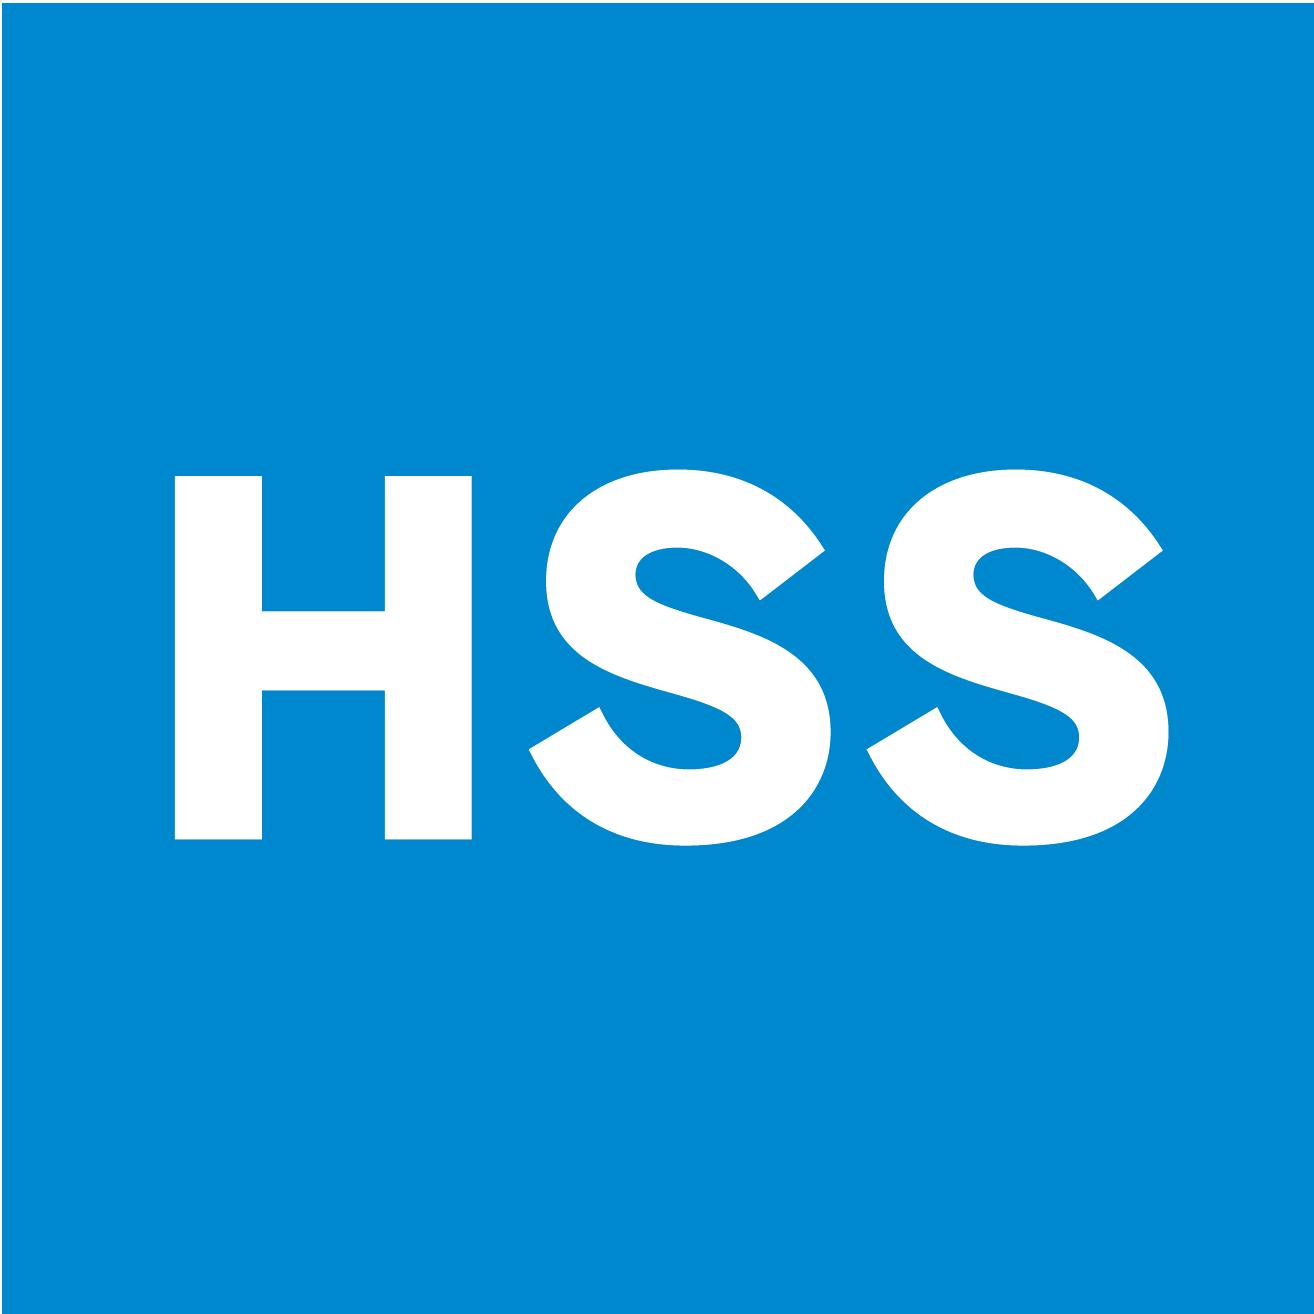 HSS_Flat_lightblue_logo-01 (1).png